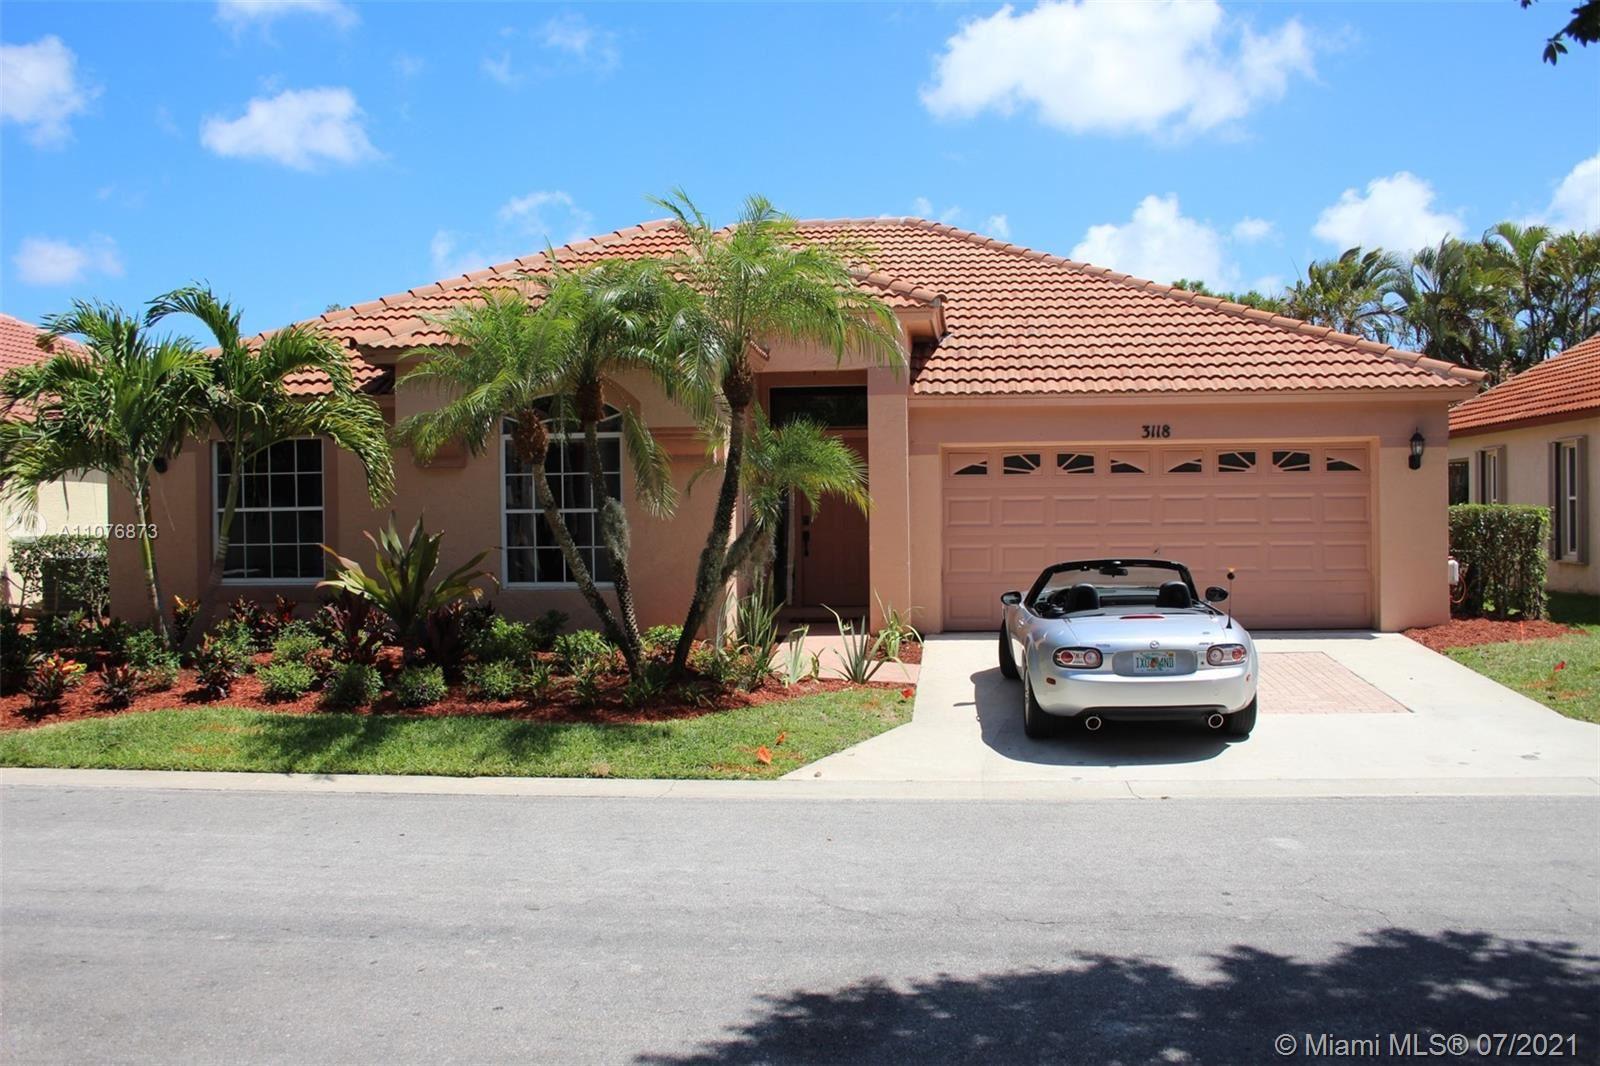 3118 Contego Ln, Riviera Beach, FL 33418 - #: A11076873